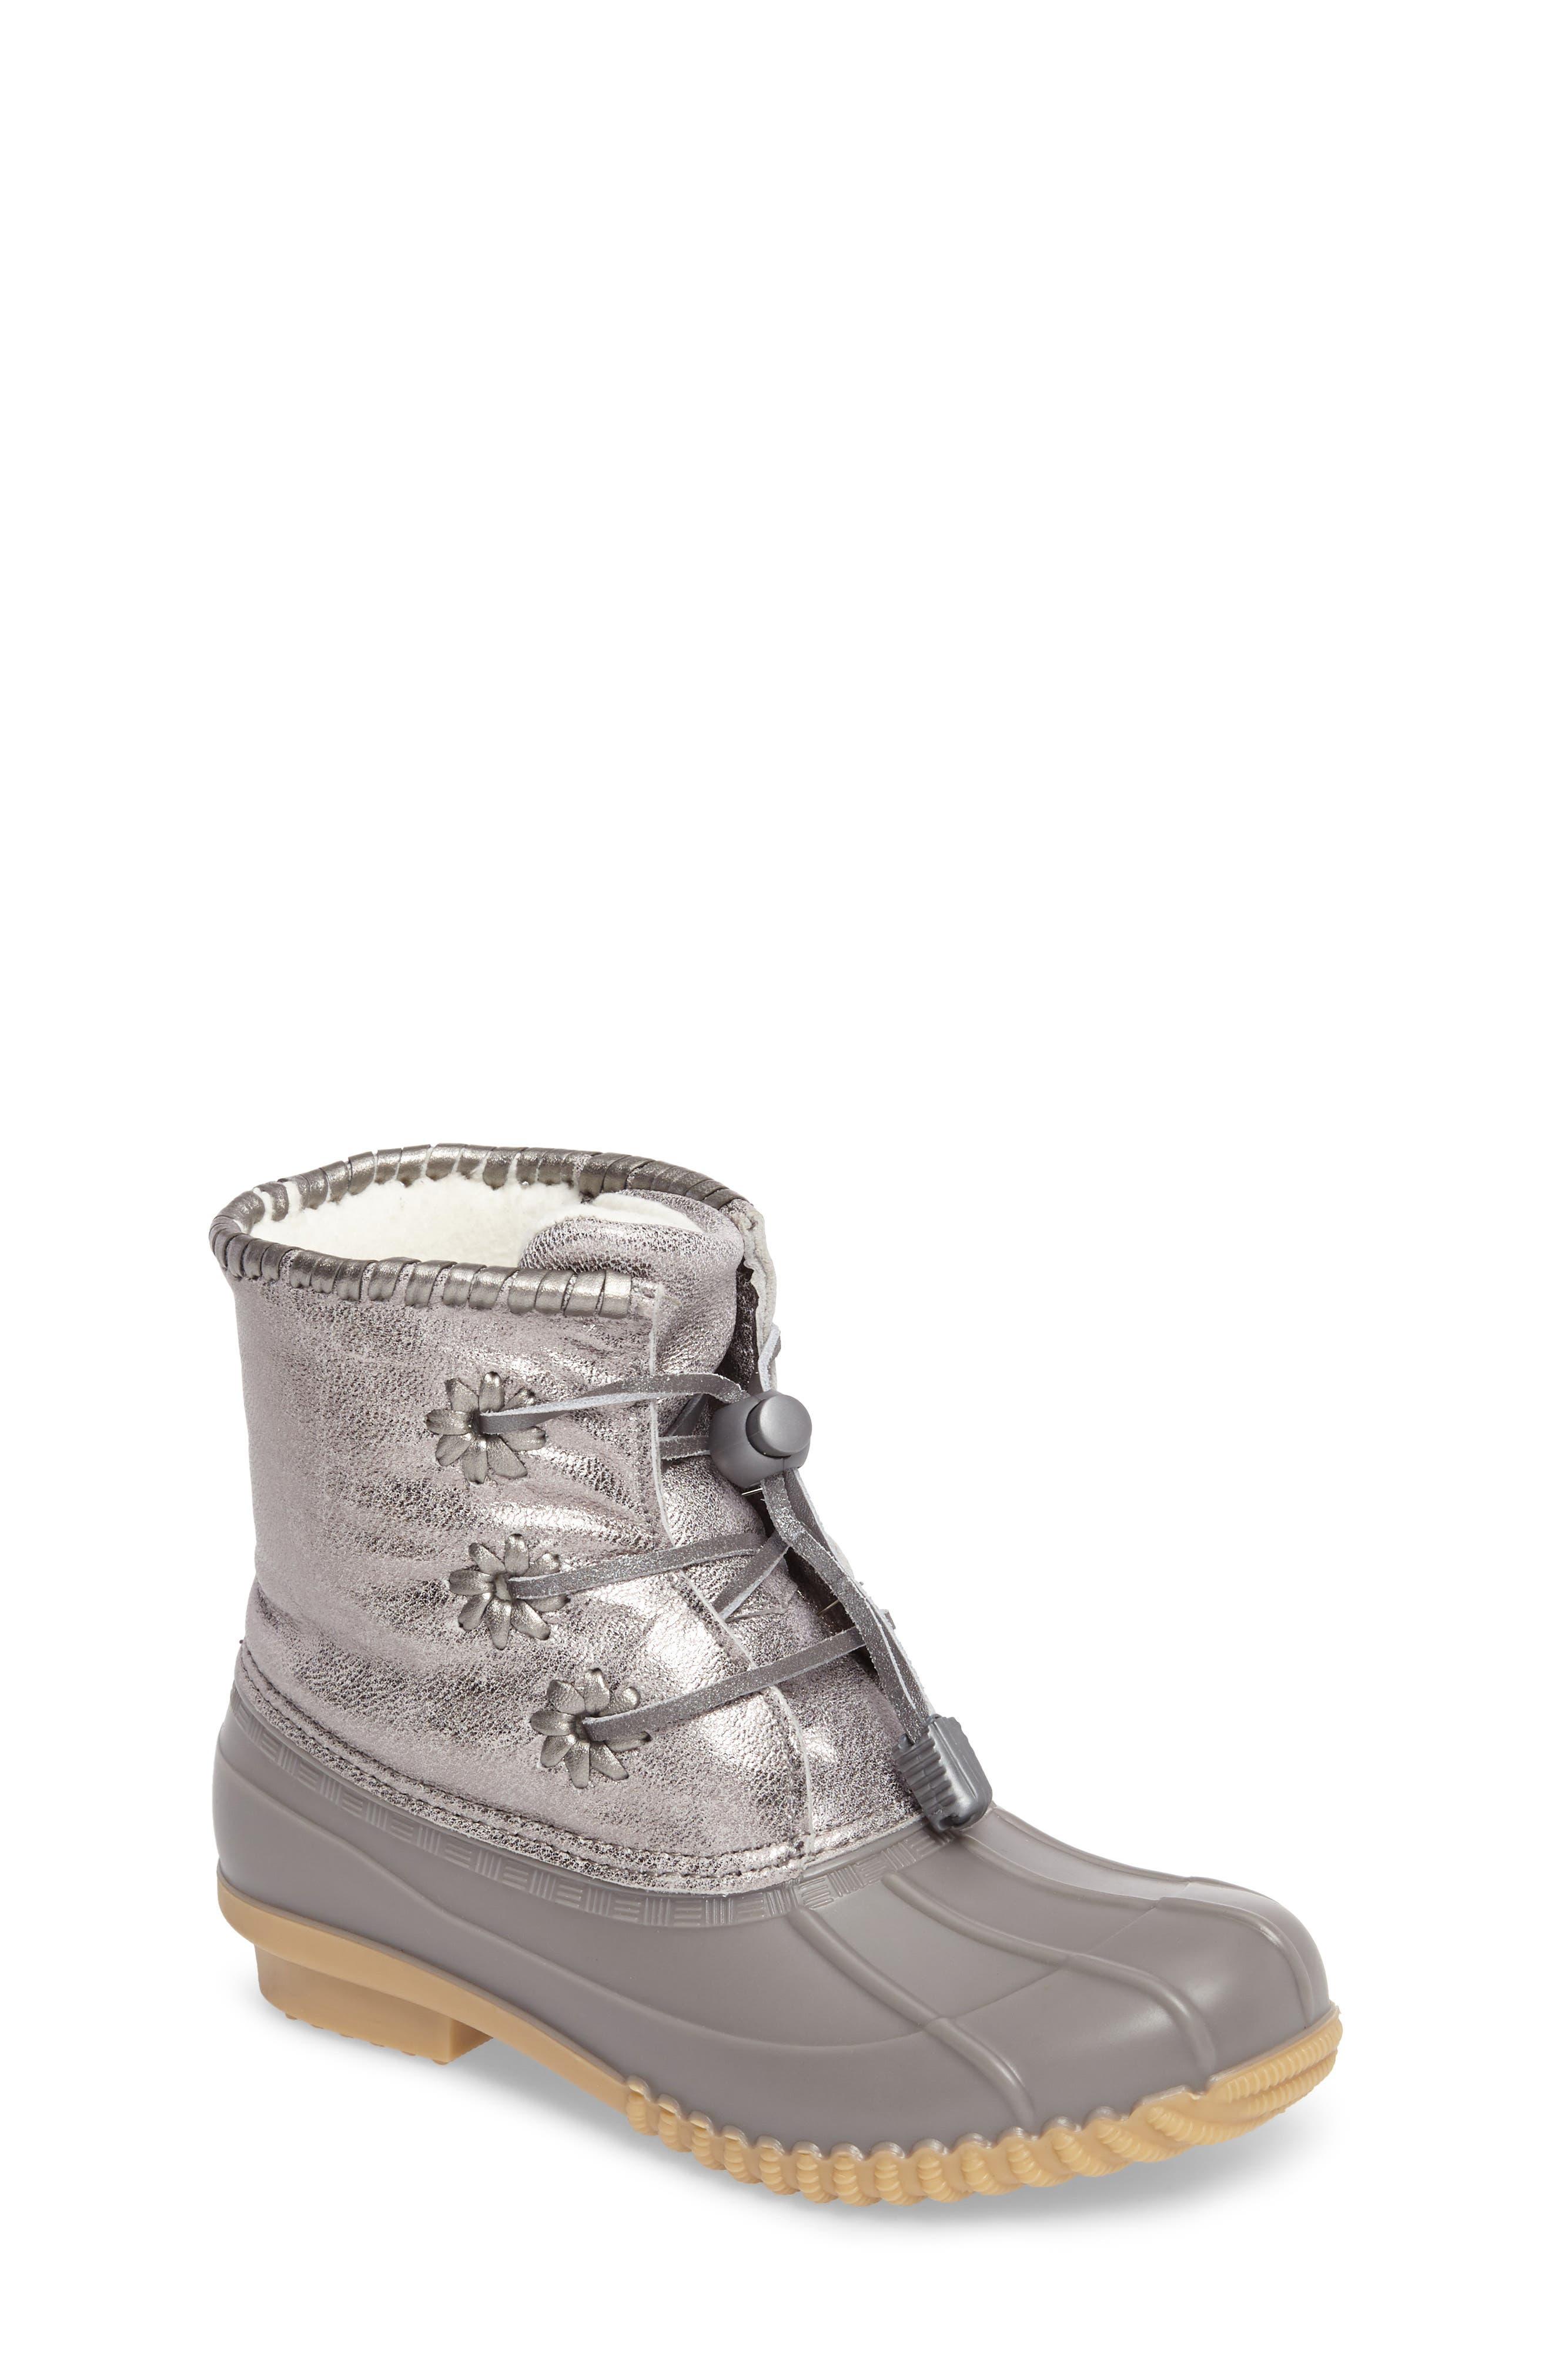 Miss Chloe Metallic Rain Boot,                         Main,                         color,